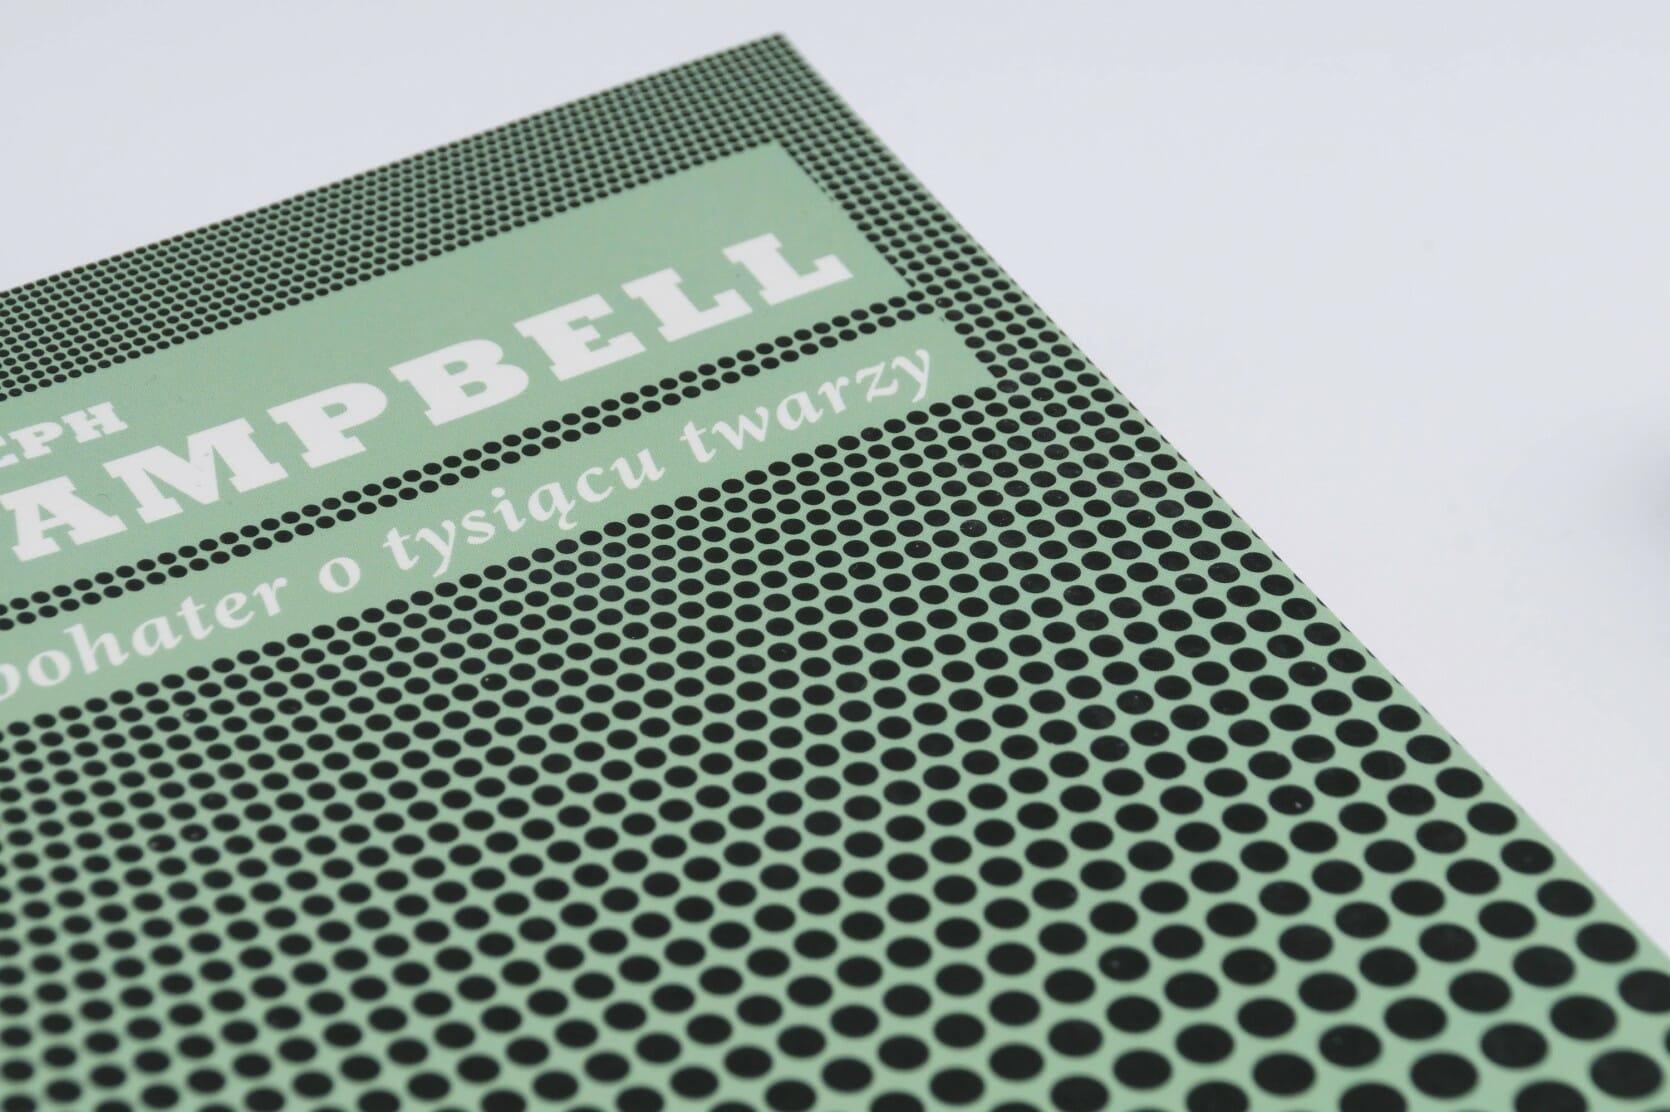 Book cover closeup — Joseph Capmpbell, Bohater o tysiącu twarzy